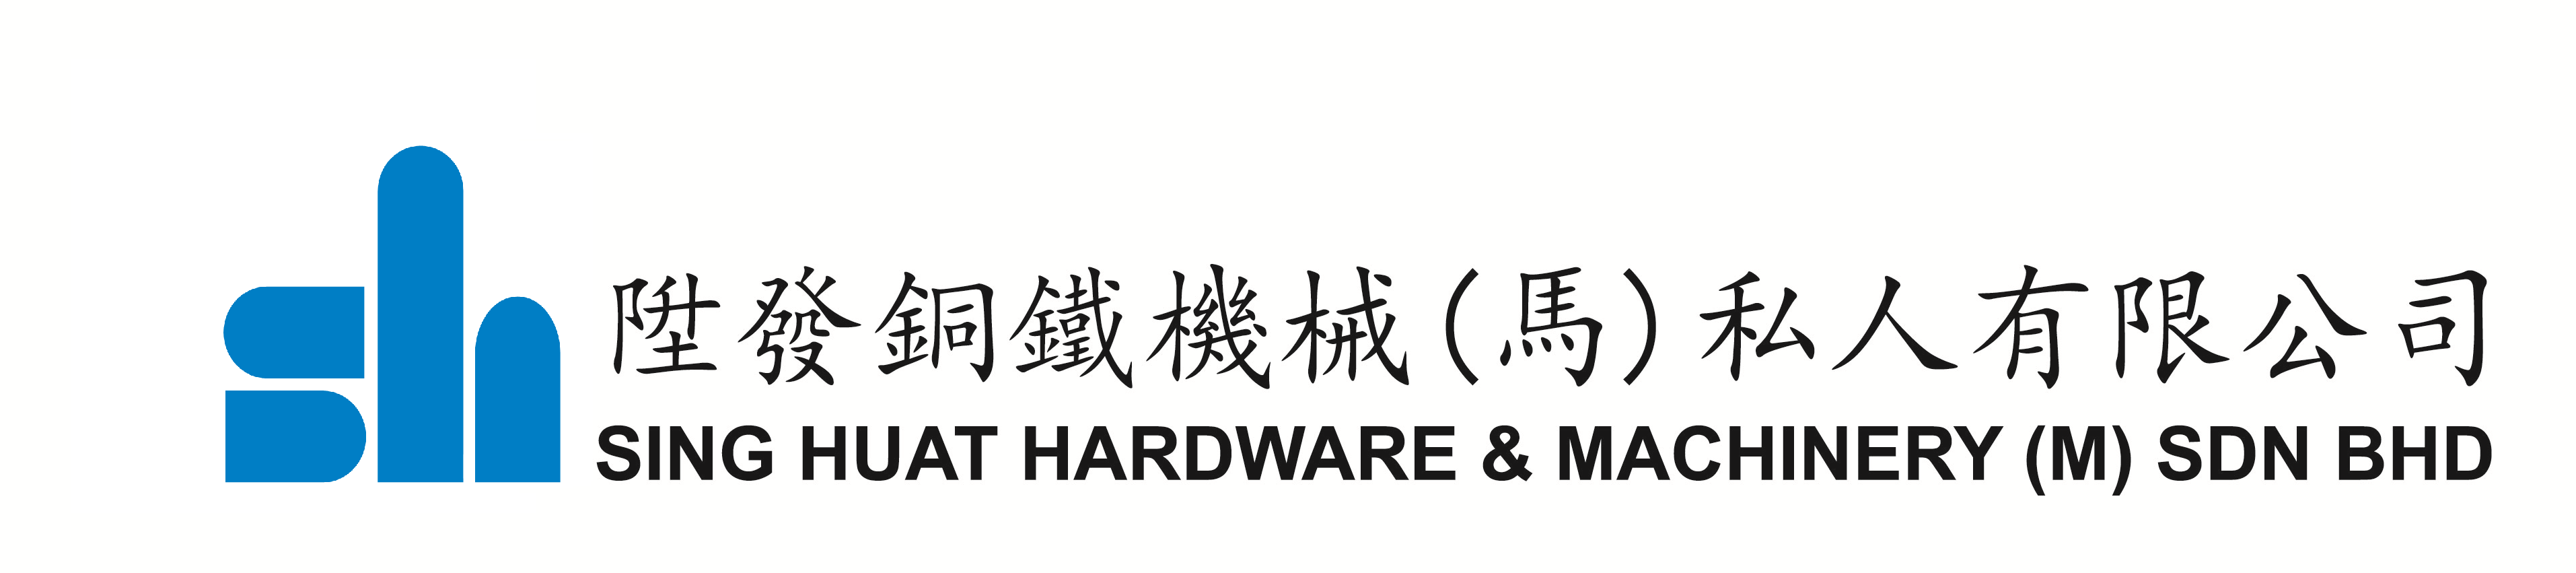 SING HUAT HARDWARE & MACHINERY (M) SDN BHD - Machine Tools